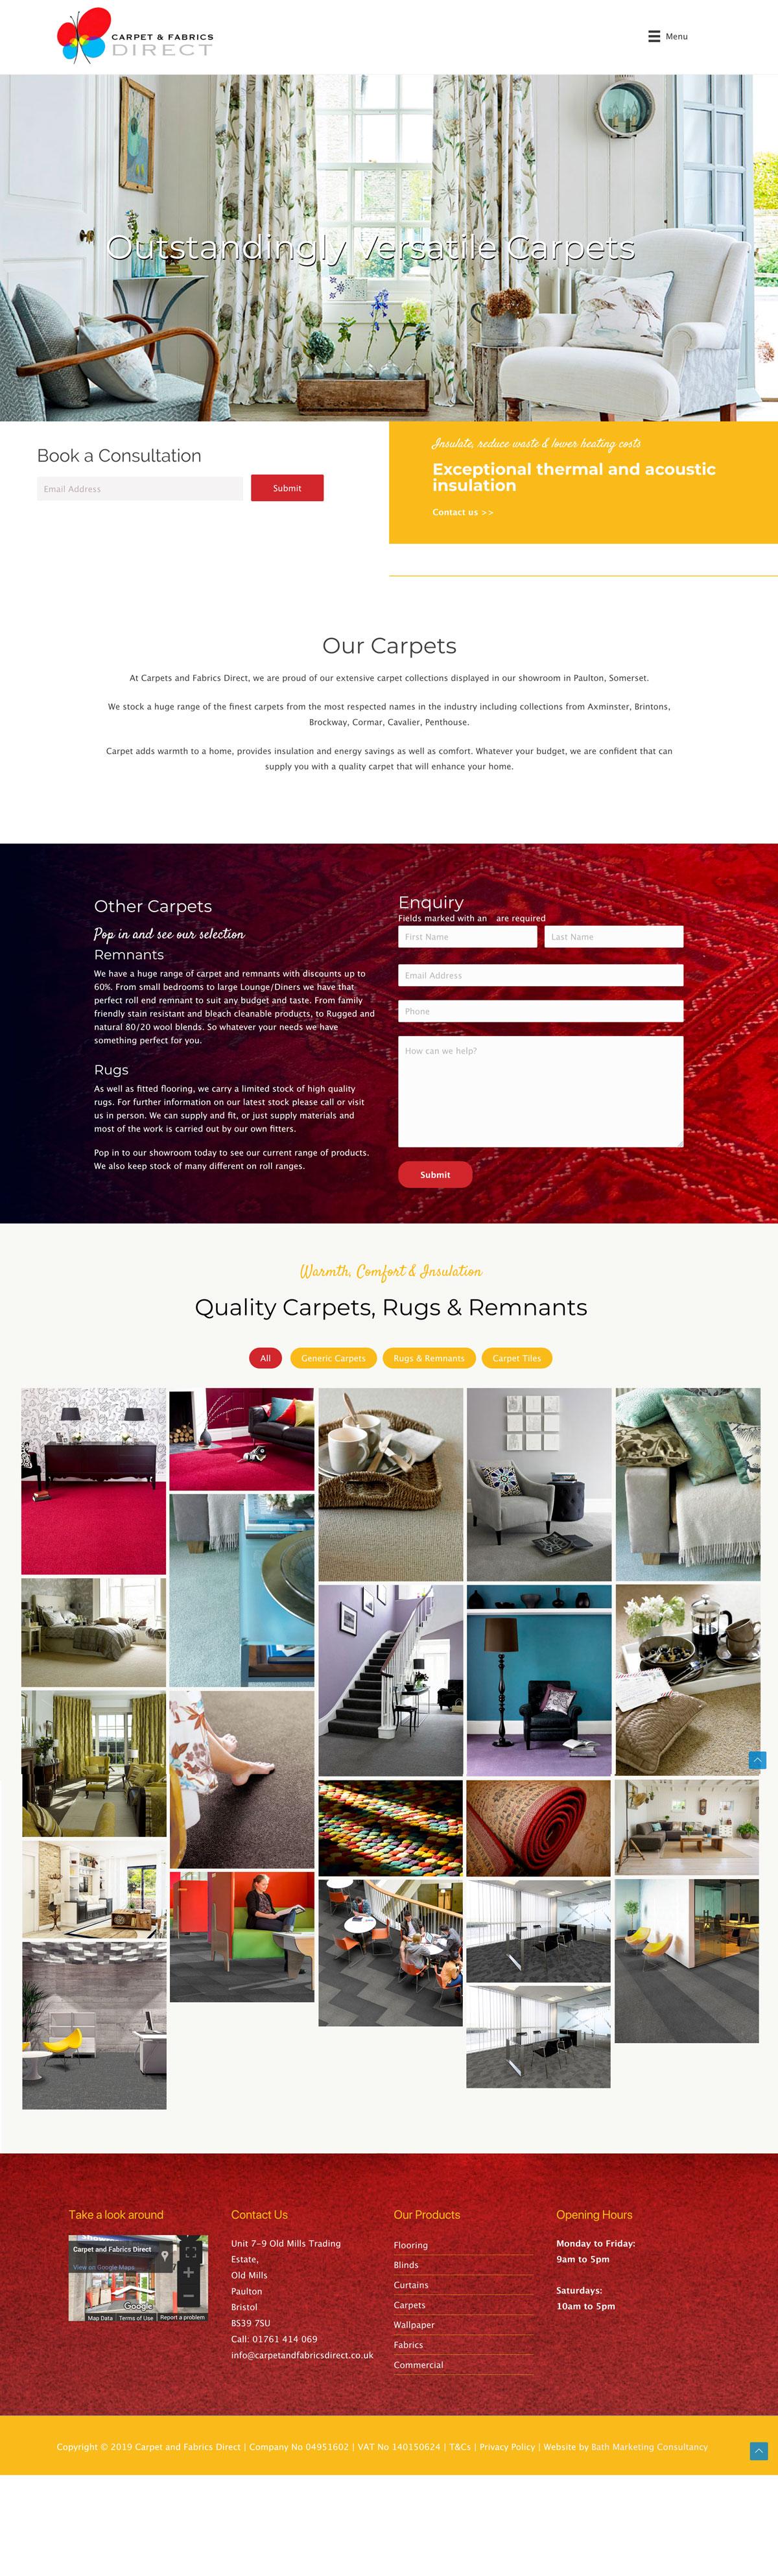 Website Design For Carpet Fabrics Website Build Content Management Systems